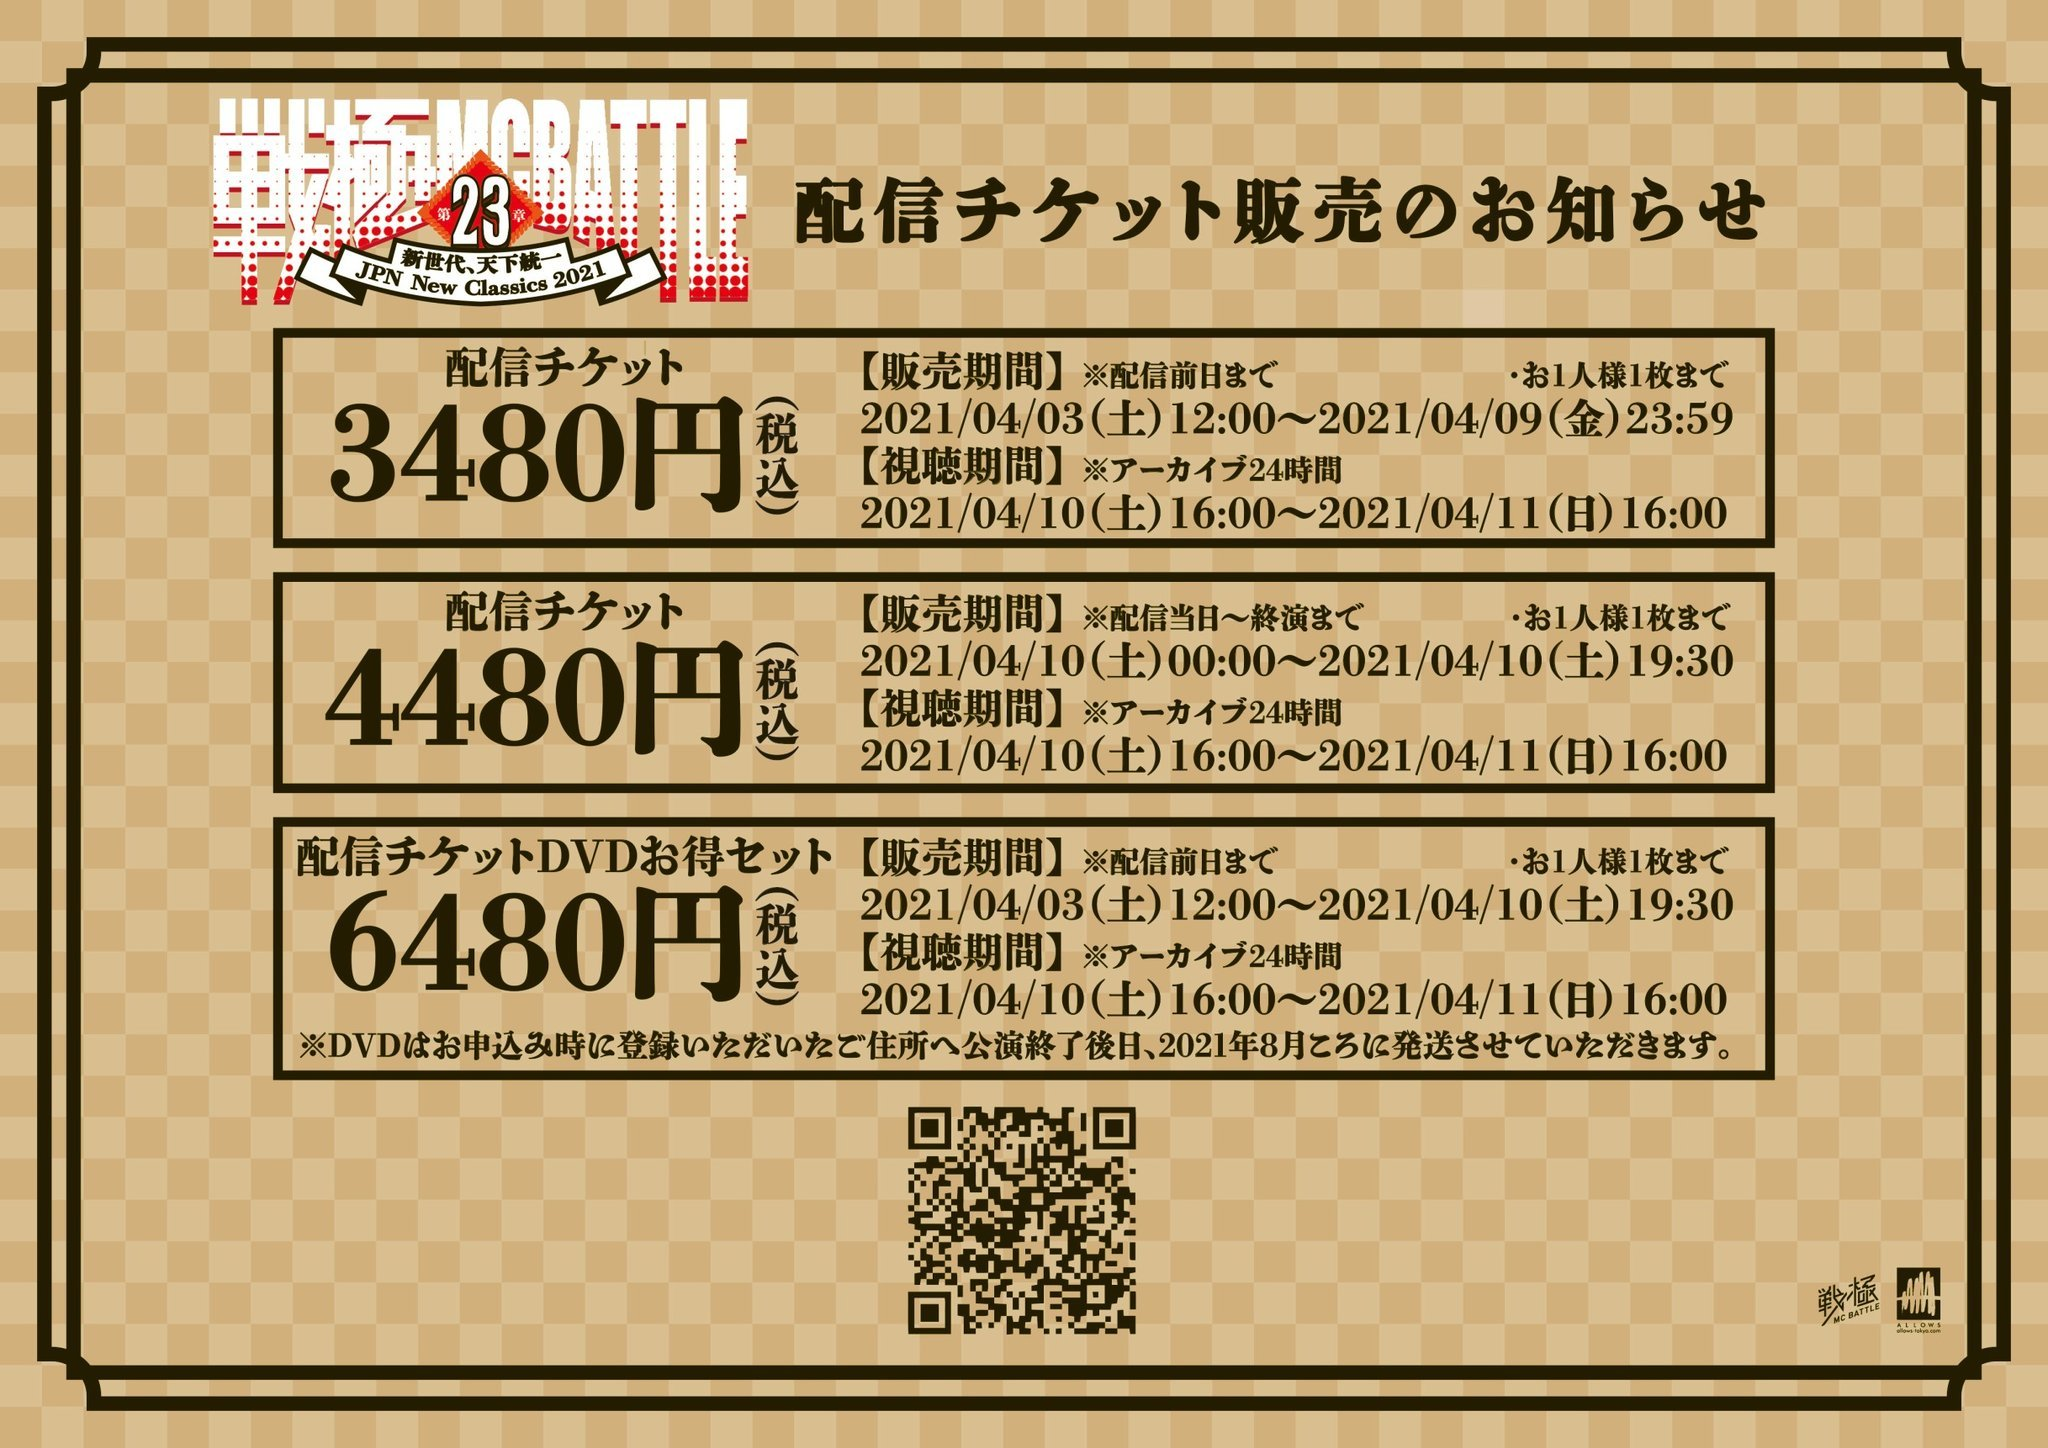 4/10 戦極MCBATTLE 第23章 New classic JPN開催決定!LIVE mu-ton追加!配信チケット販売開始!_e0246863_16102248.jpg